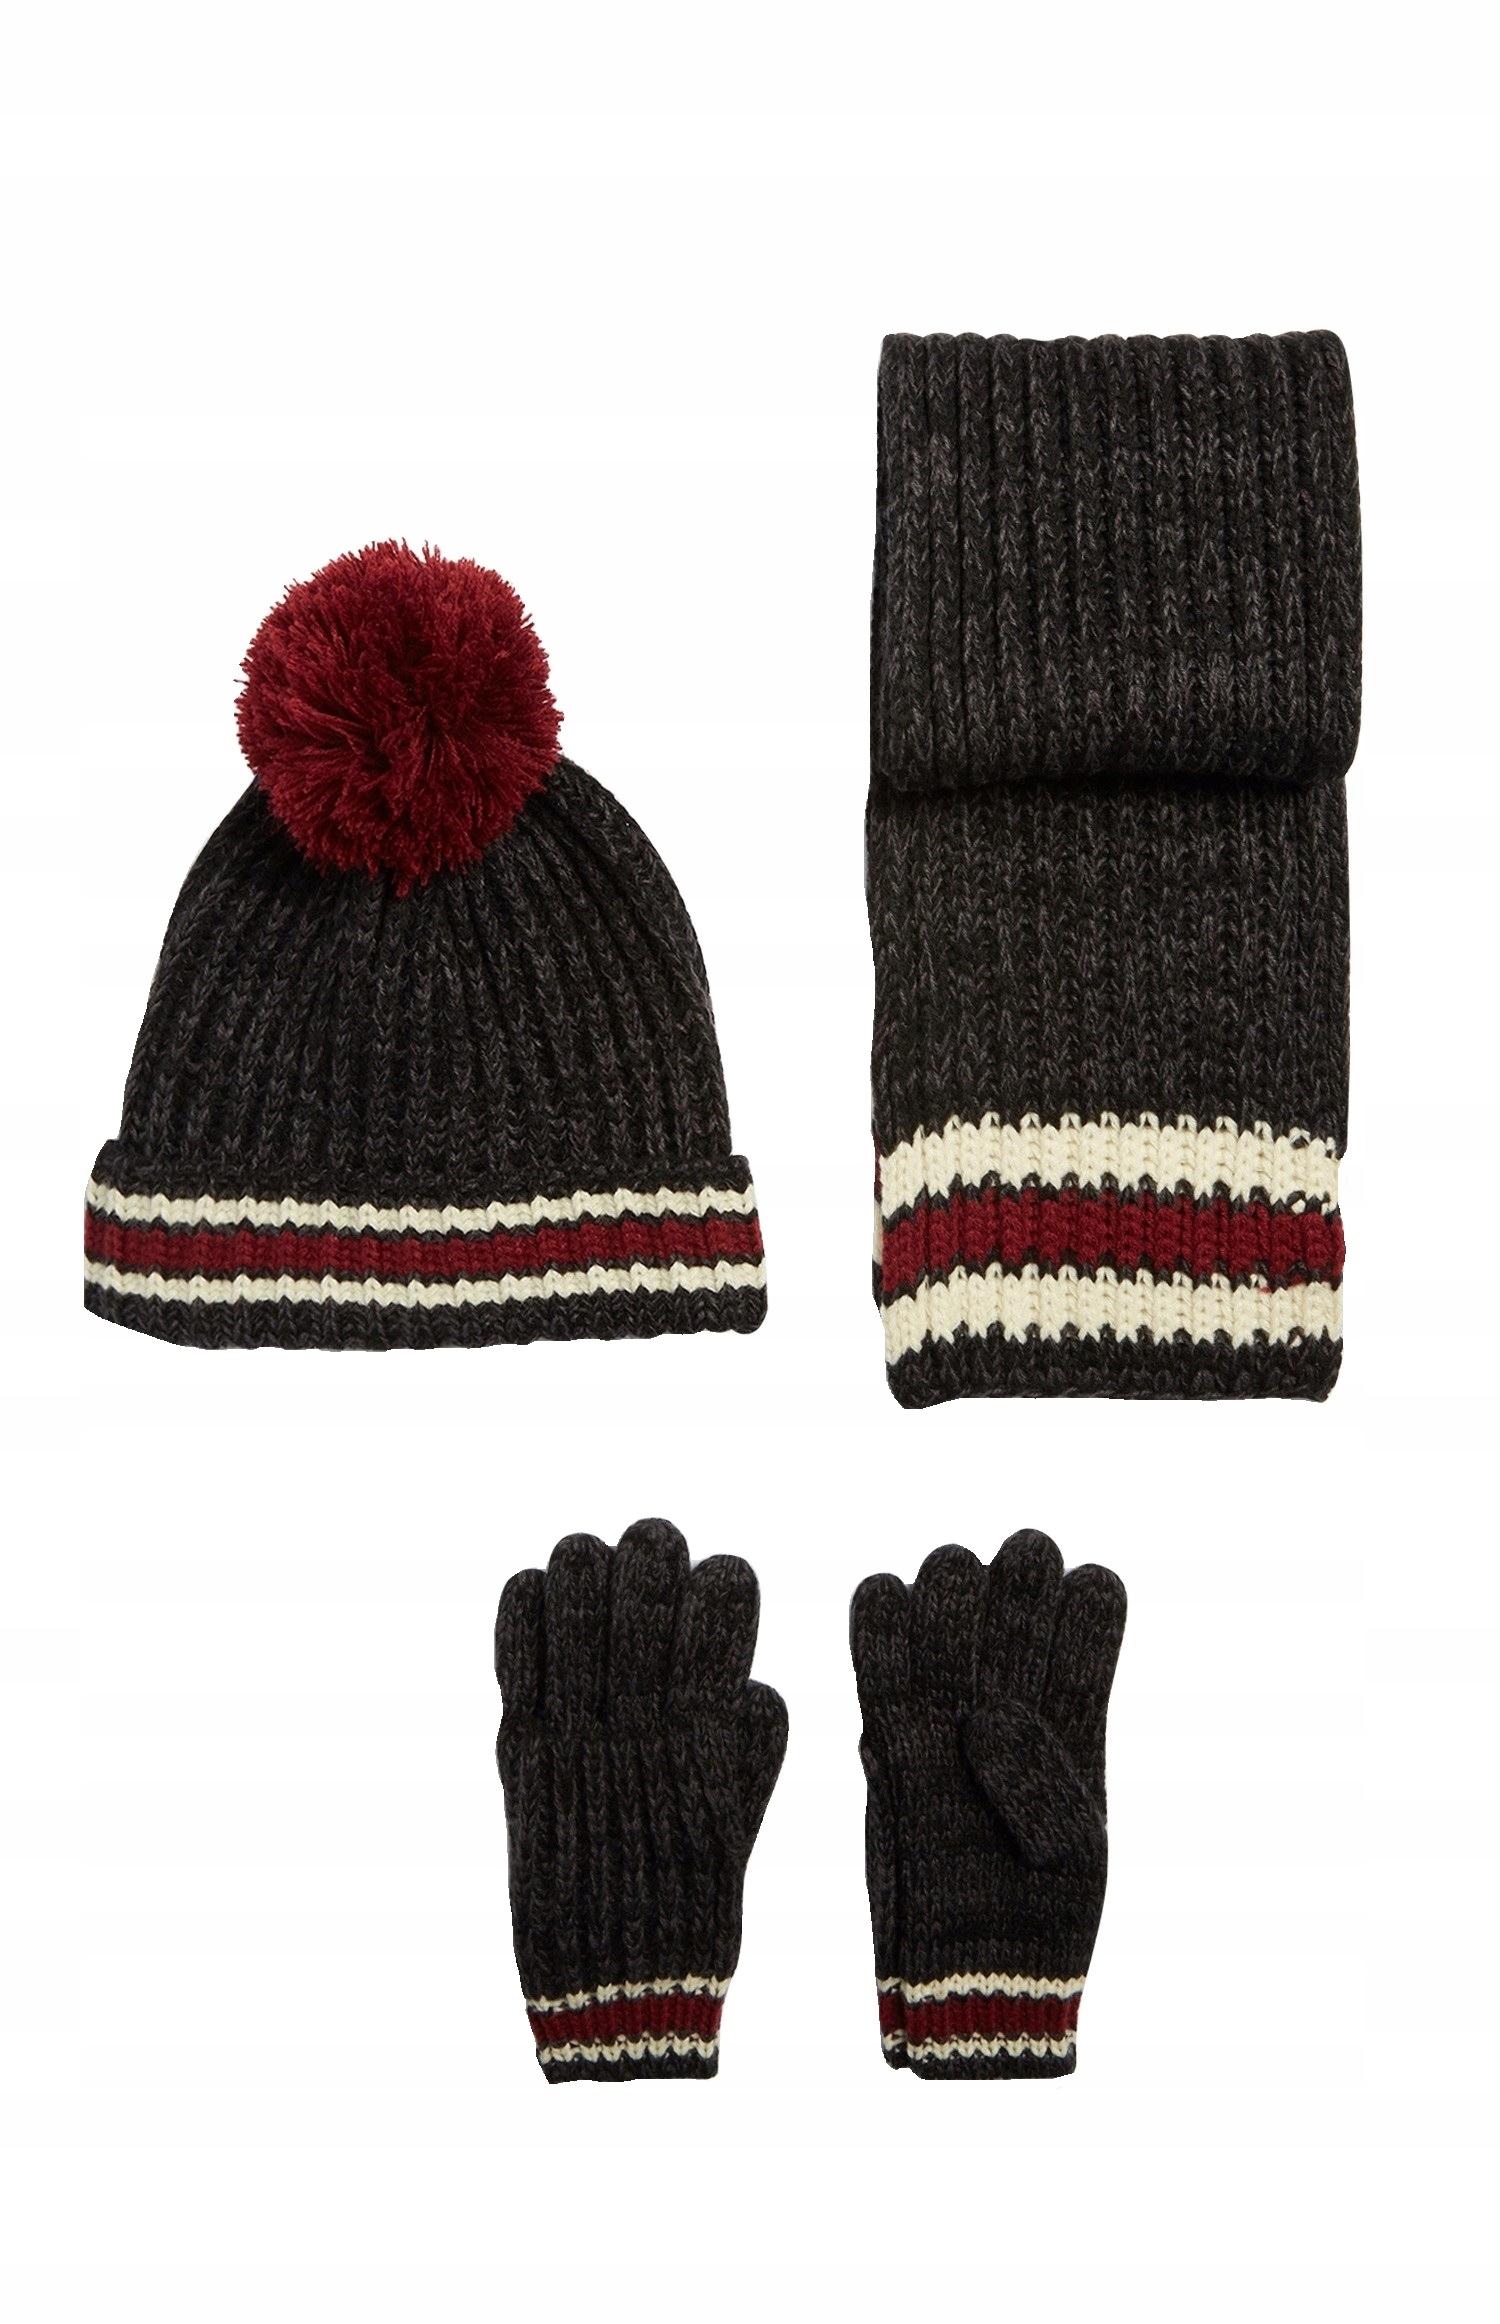 Rebel komplet 3 - 6 lat szalik czapka rękawiczki